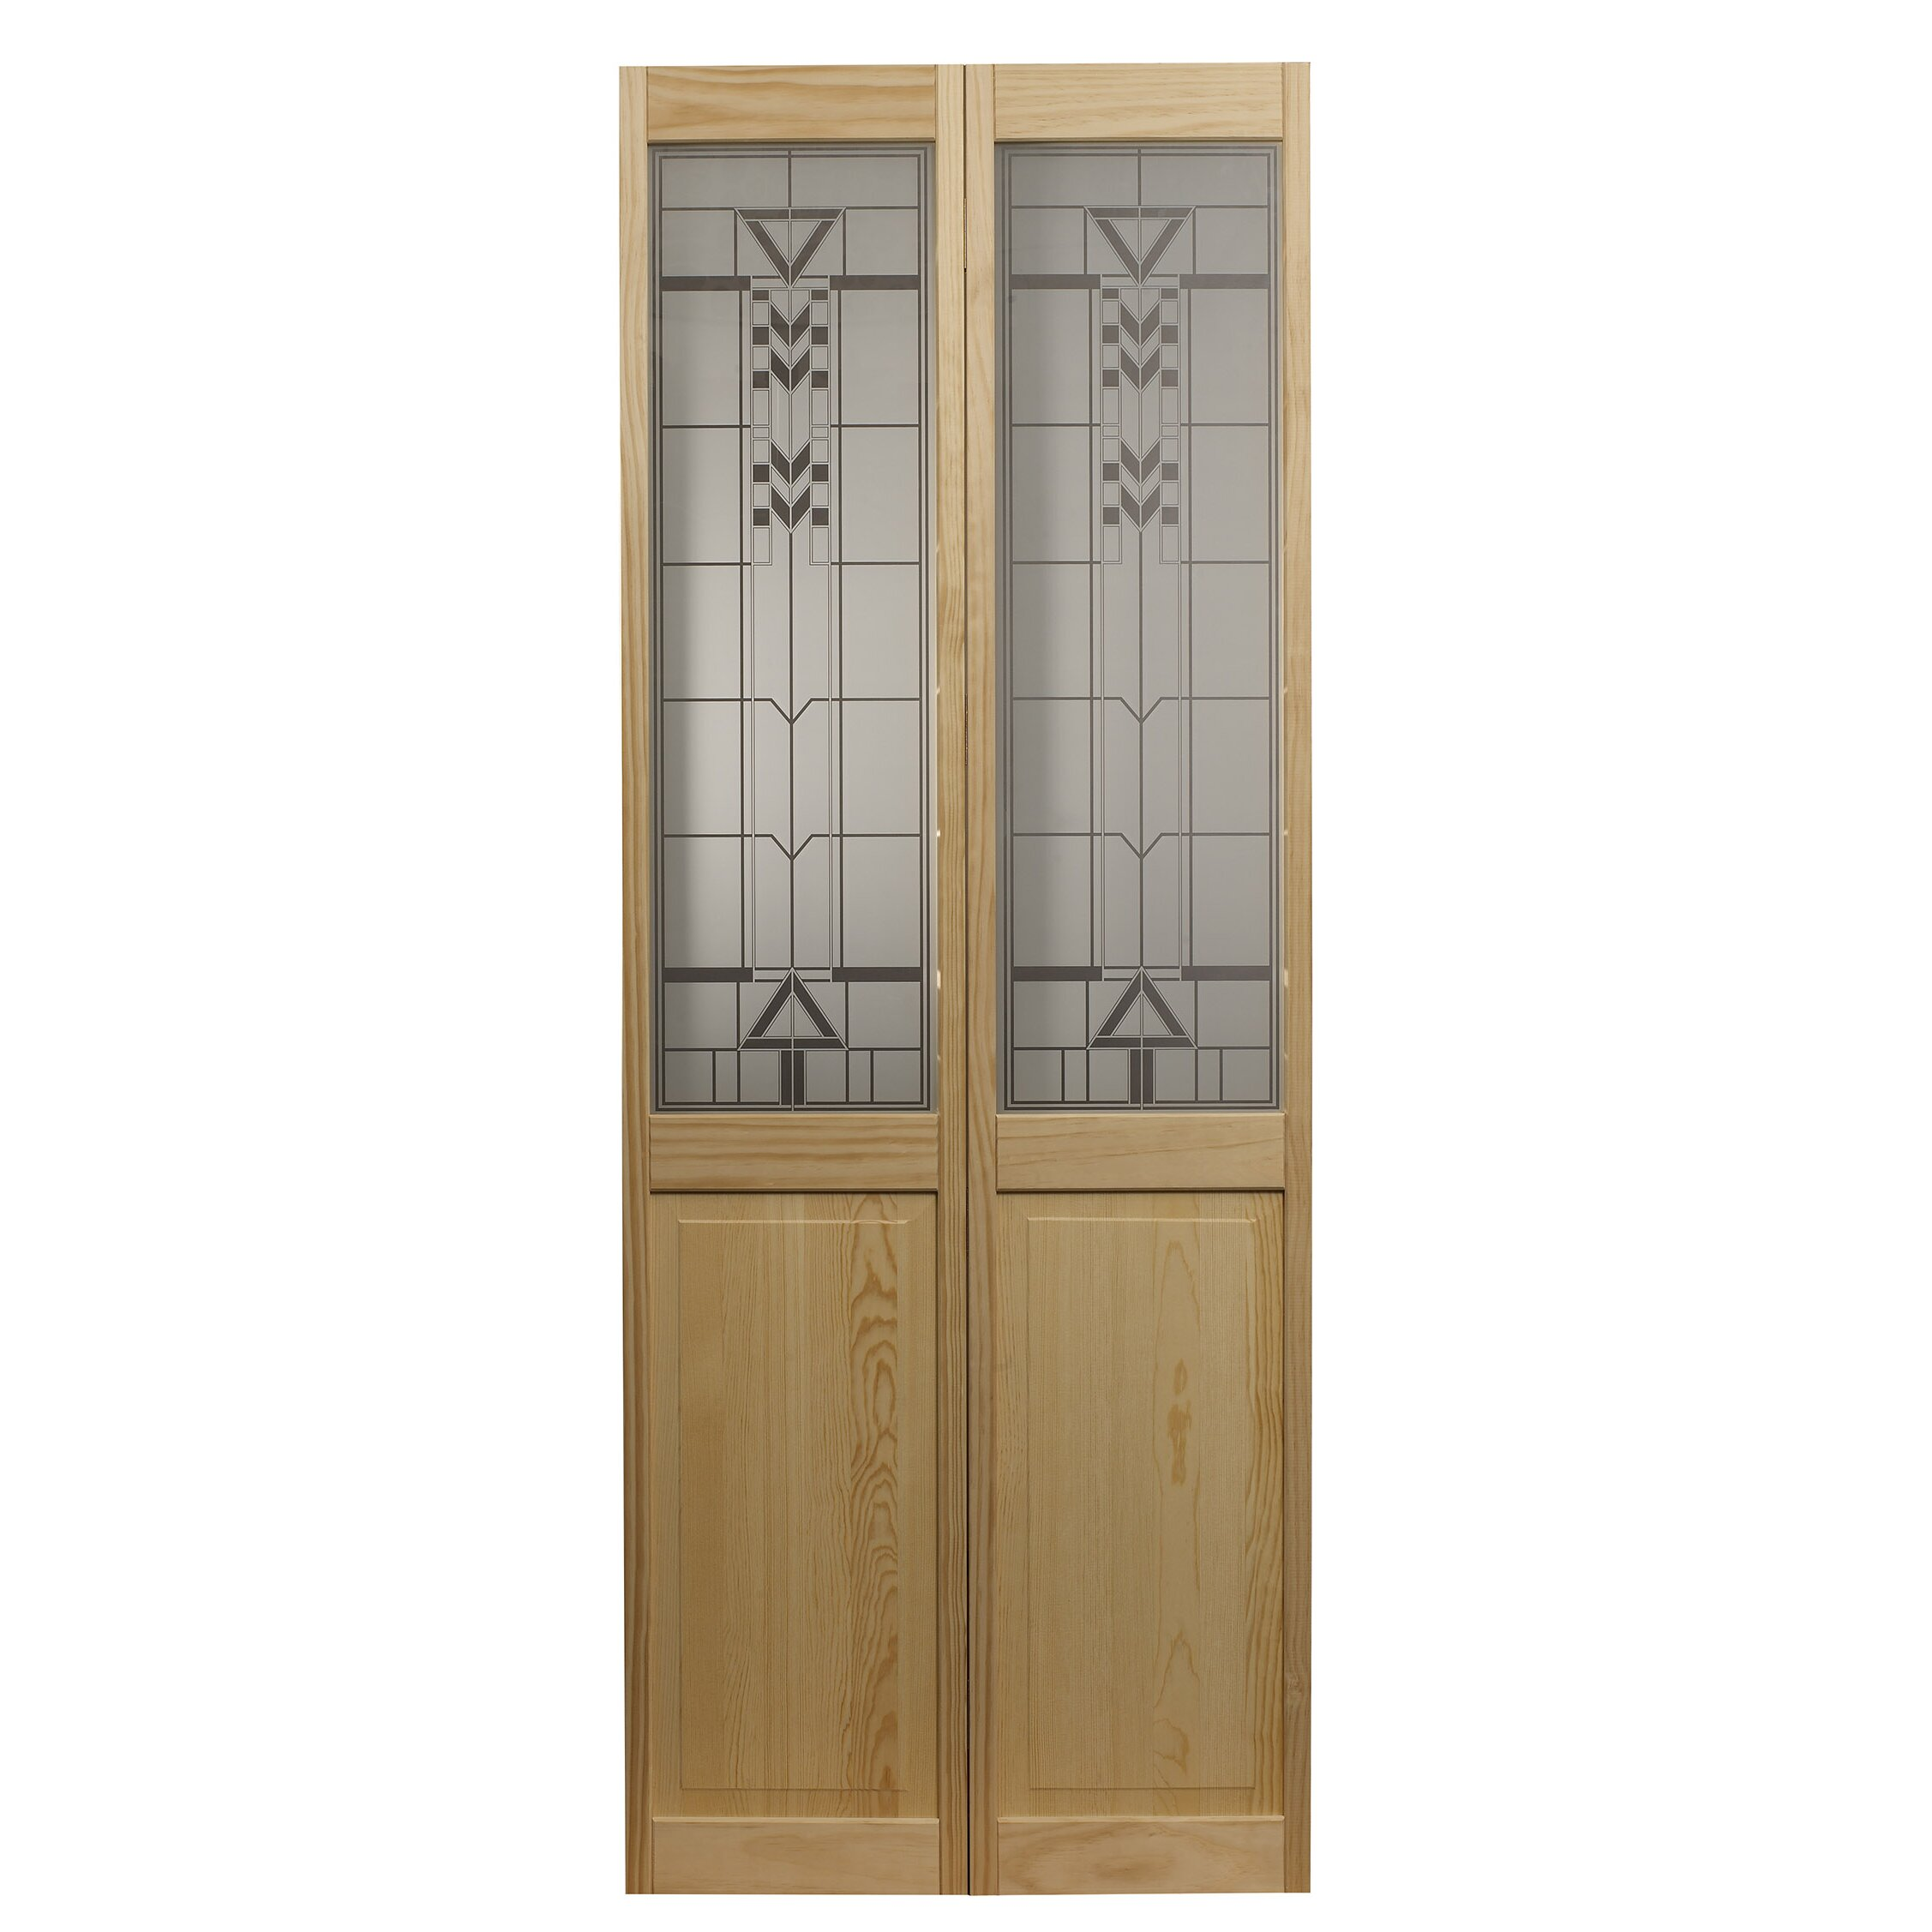 LTL Bi Fold Doors Pinecroft Wood Unfinished Bi Fold Interior Door Revie